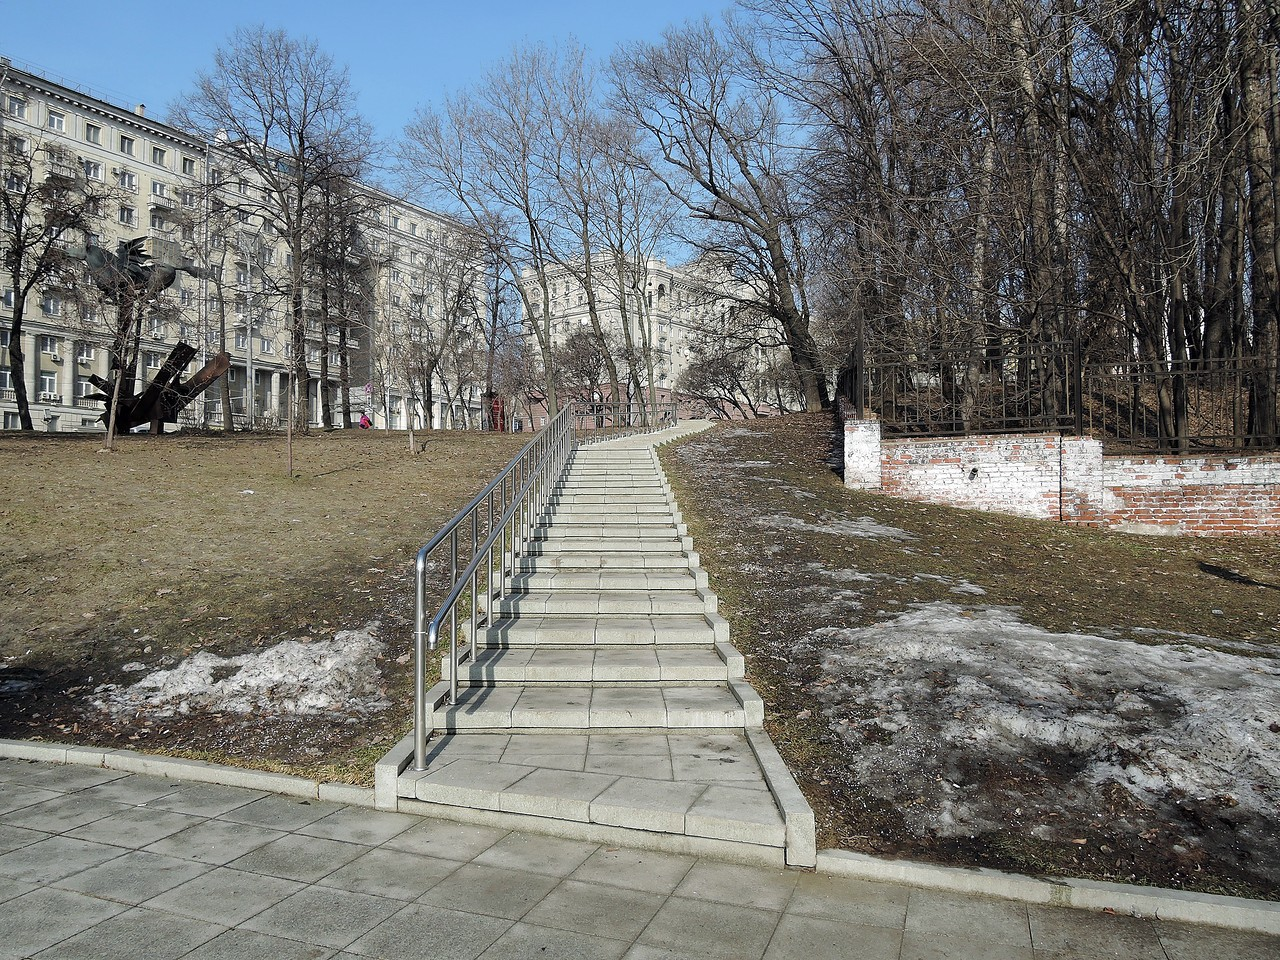 Сквер возле музея имени А.Д.Сахарова